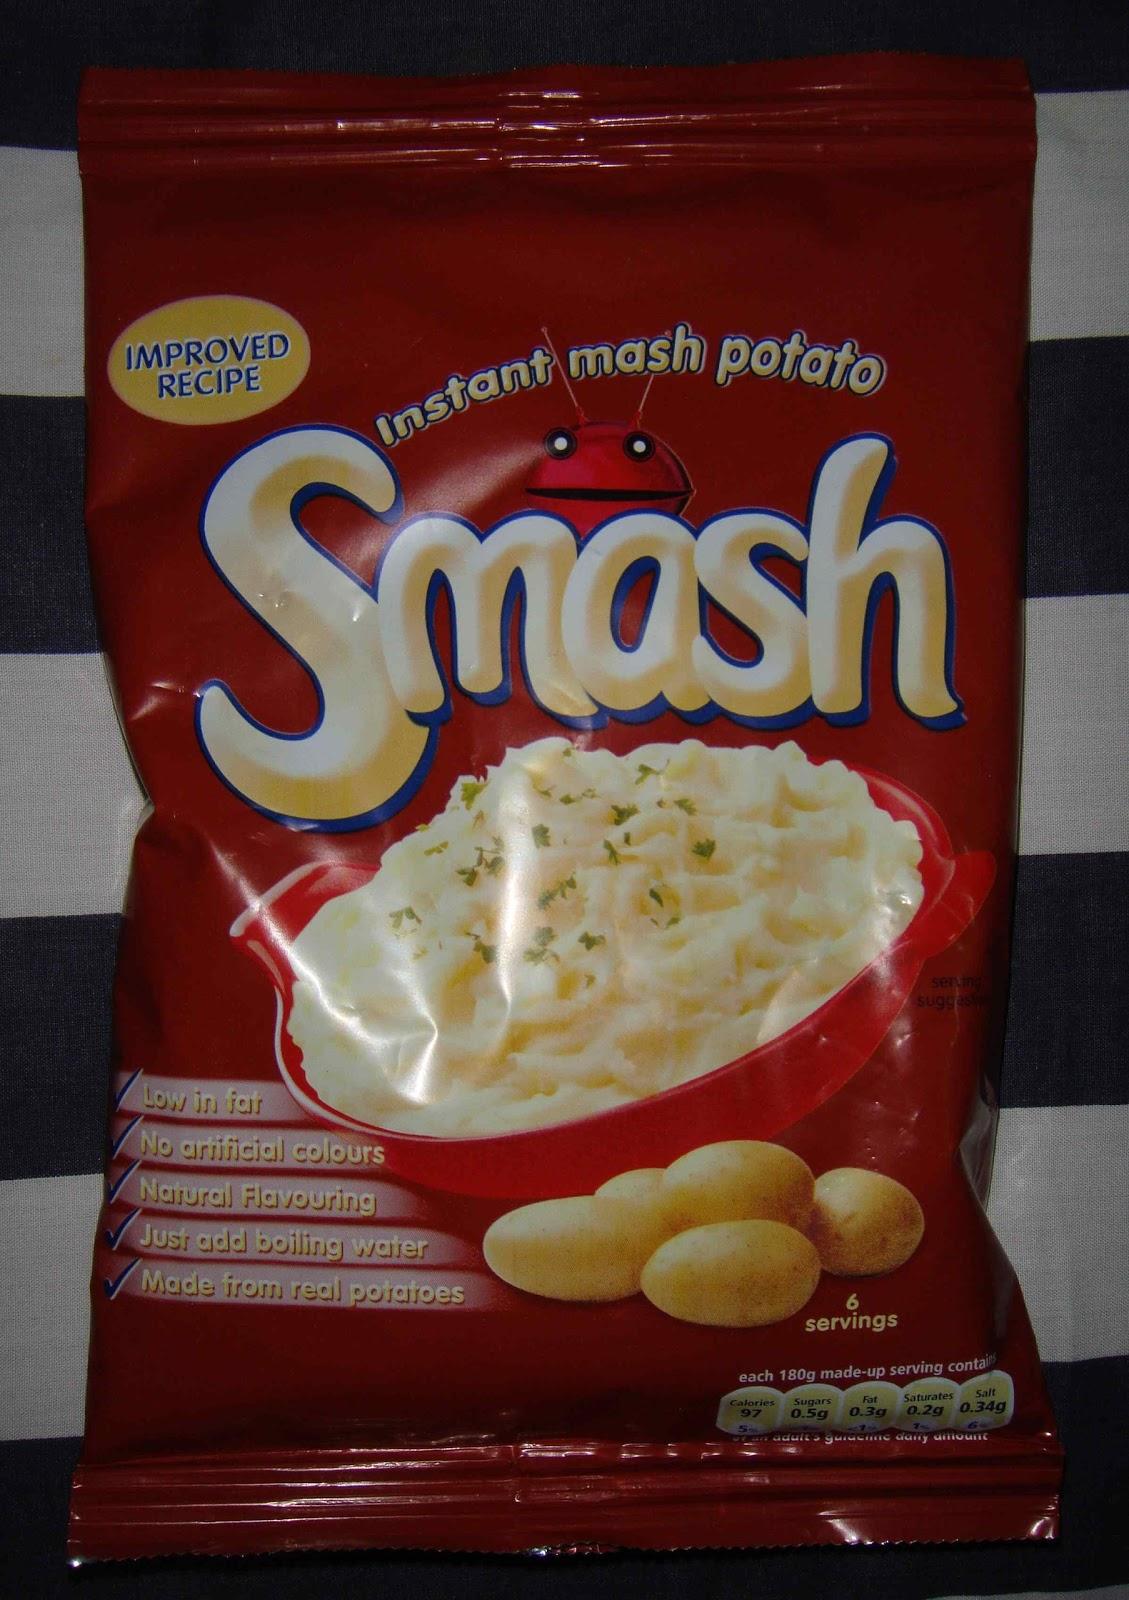 Supersupergirls Food Reviews Smash Instant Mashed Potato Makaroni Rasa Banana Taro